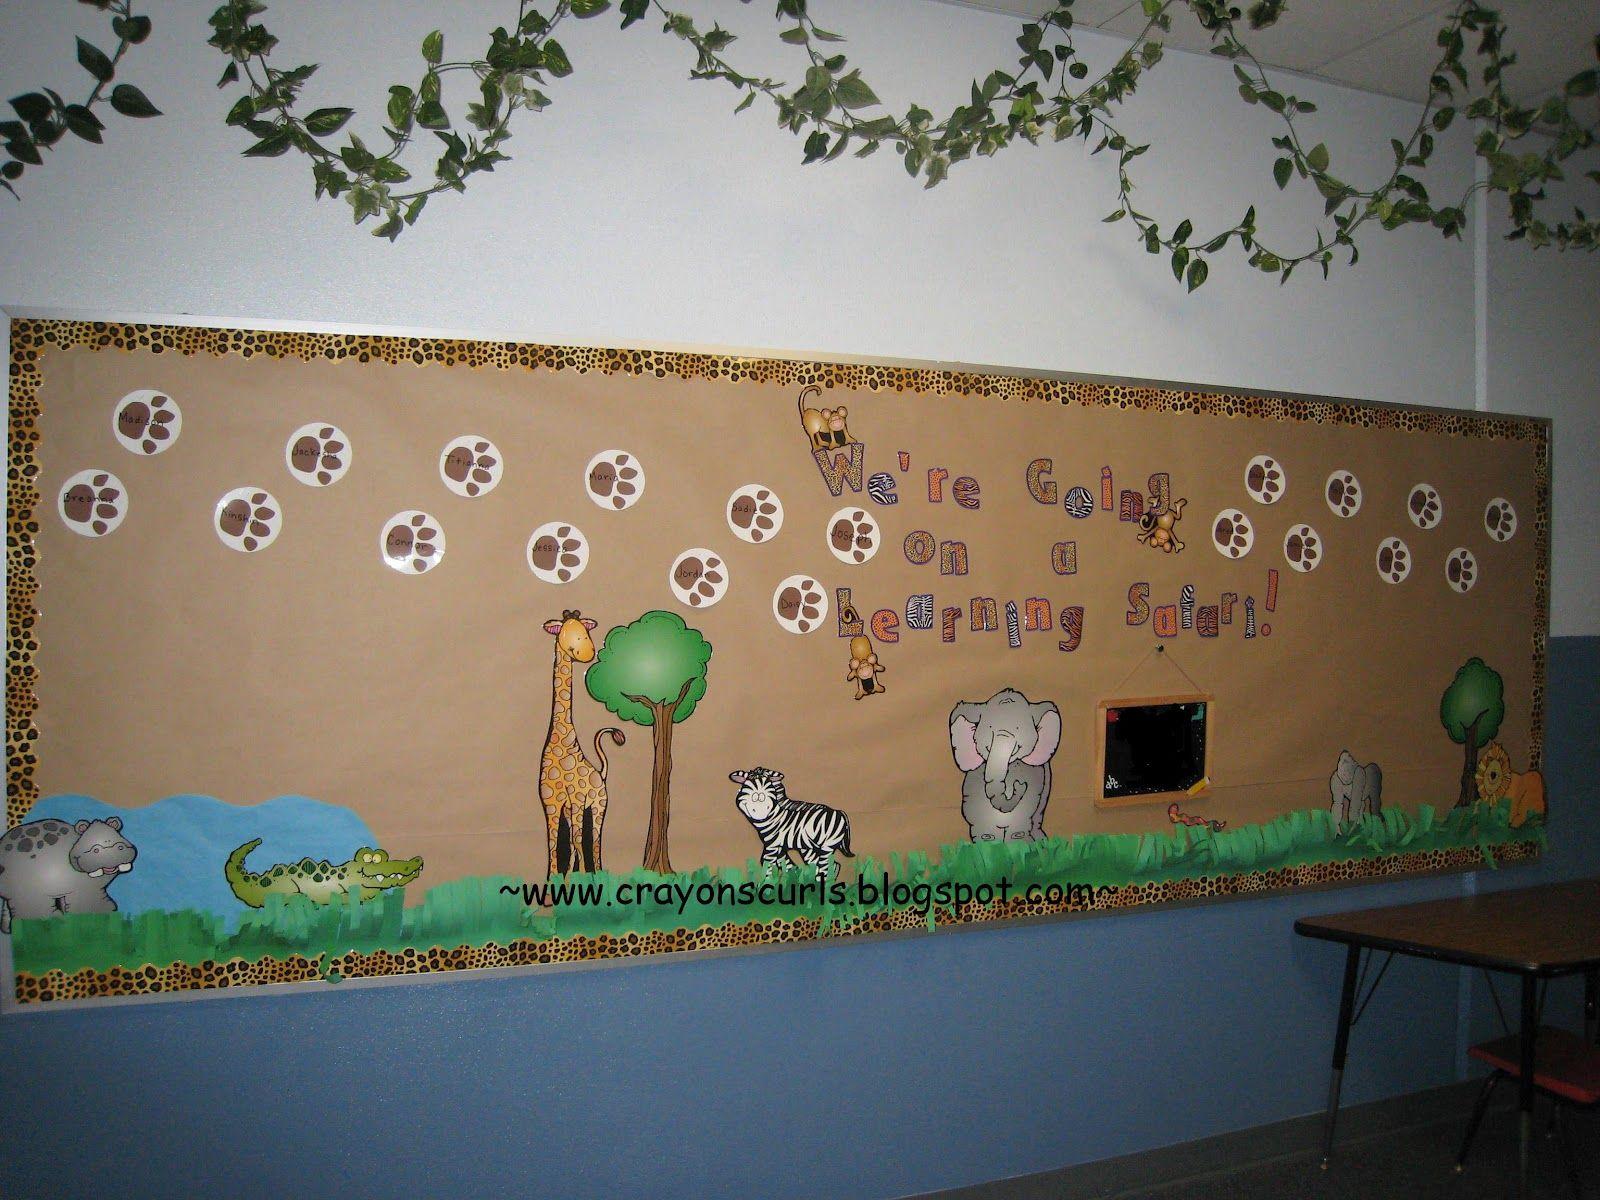 Google themes on safari - Back To School Safari Theme Bulletin Board From Crayons Curls